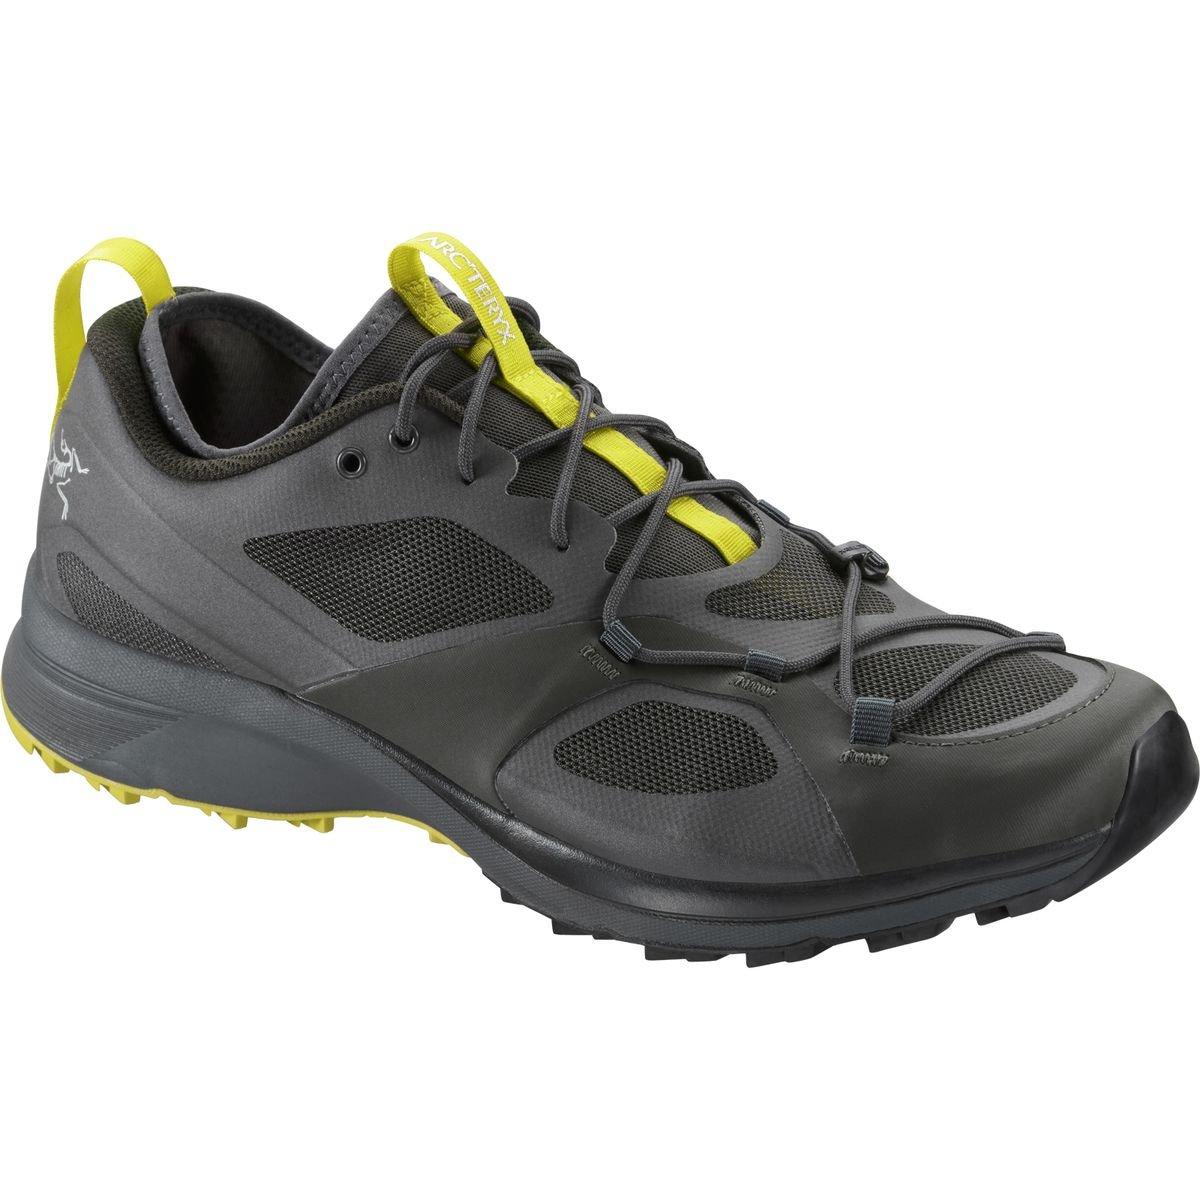 Arc'teryx Norvan VT Trail Running Shoe - Men's B075FK7G3L 7 D(M) US|Titan/Sulphur Spring